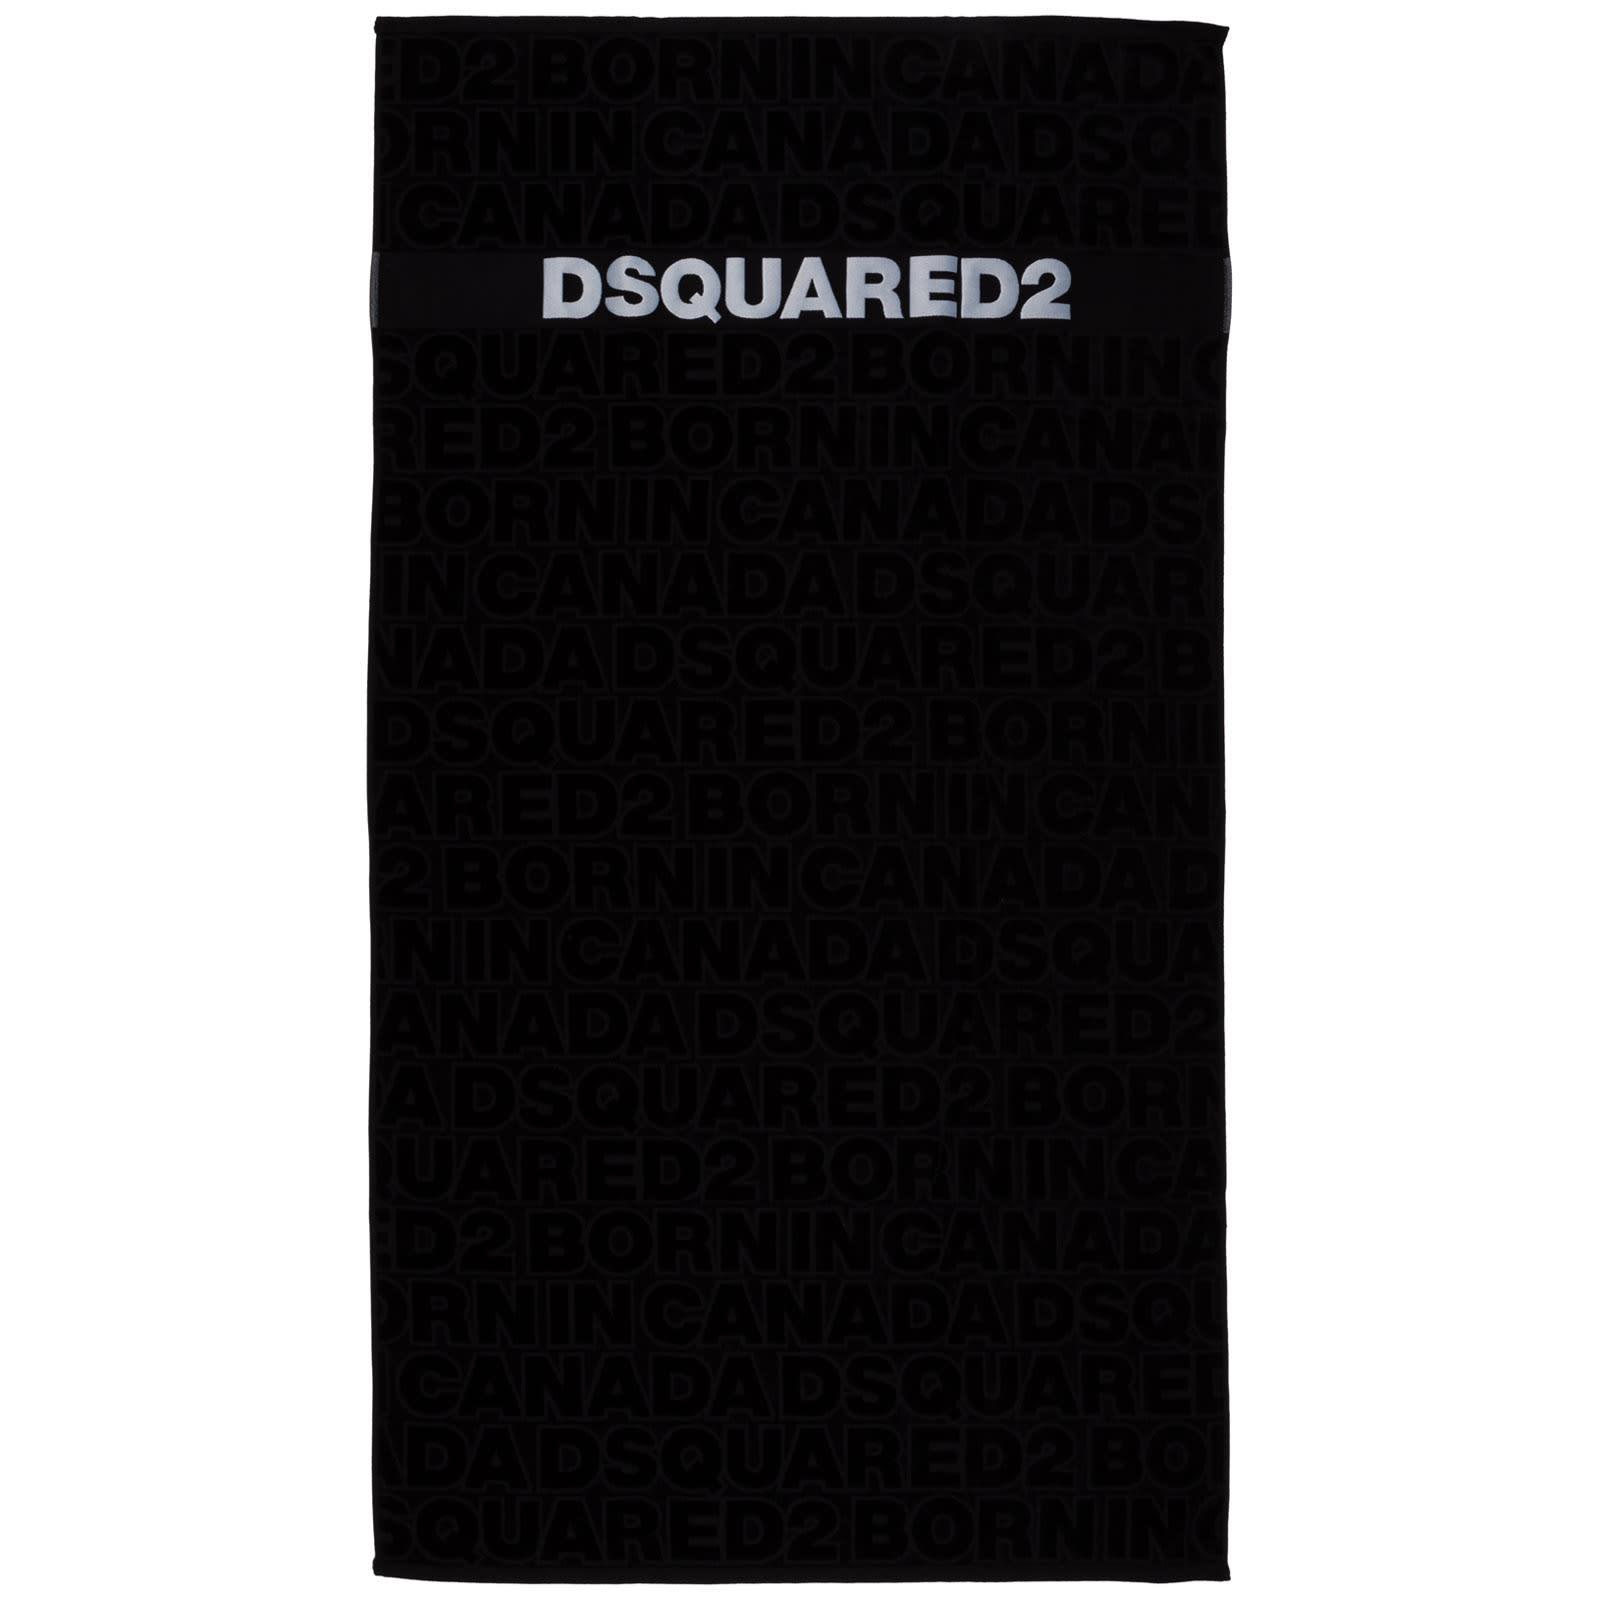 Dsquared2 Cross Beach Towels In Nero